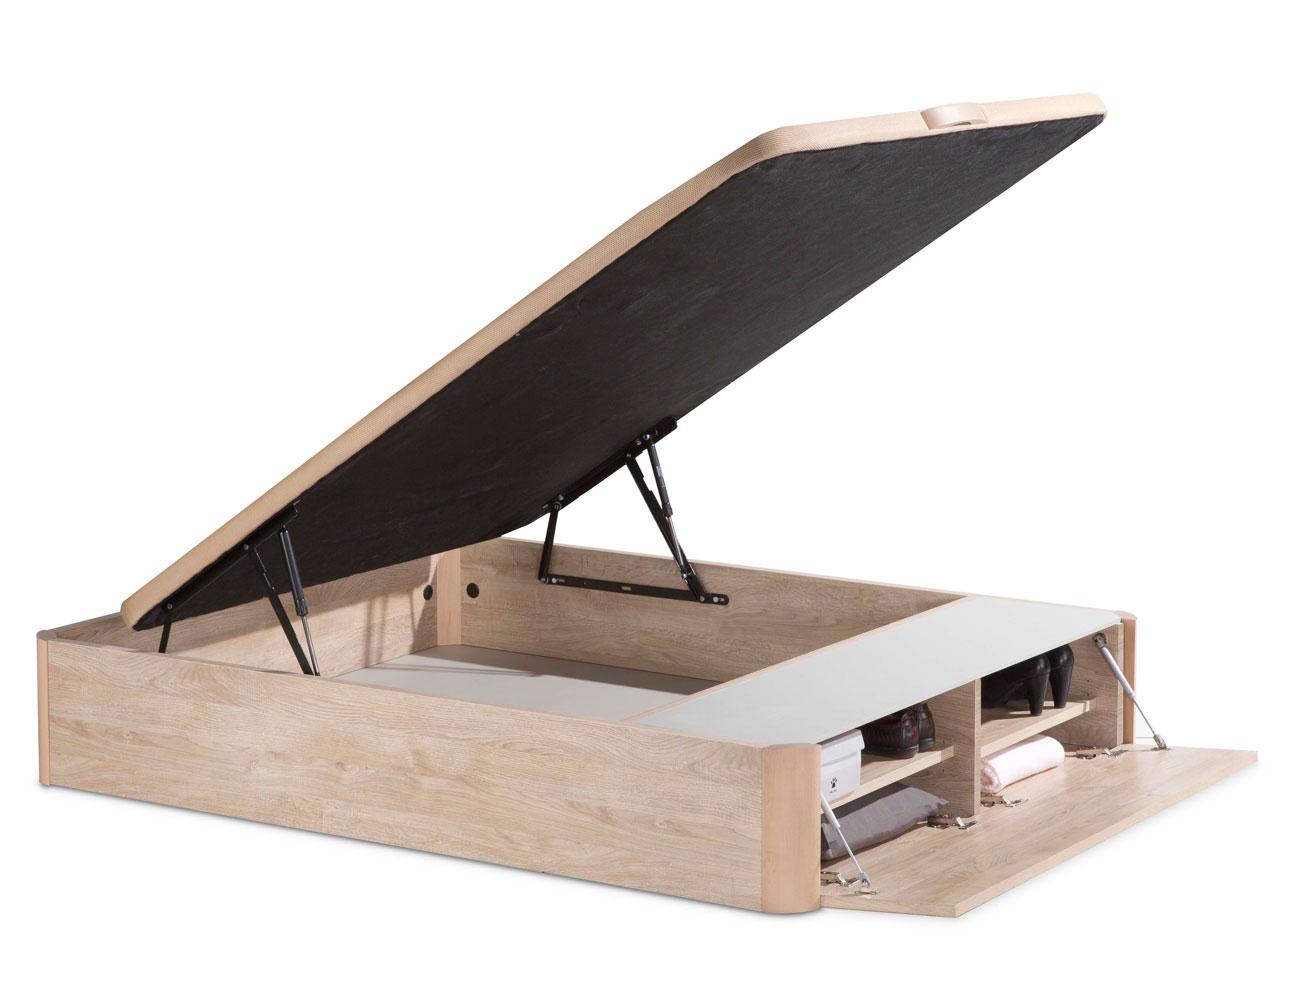 Canape zapatero madera tapa 3d 7610